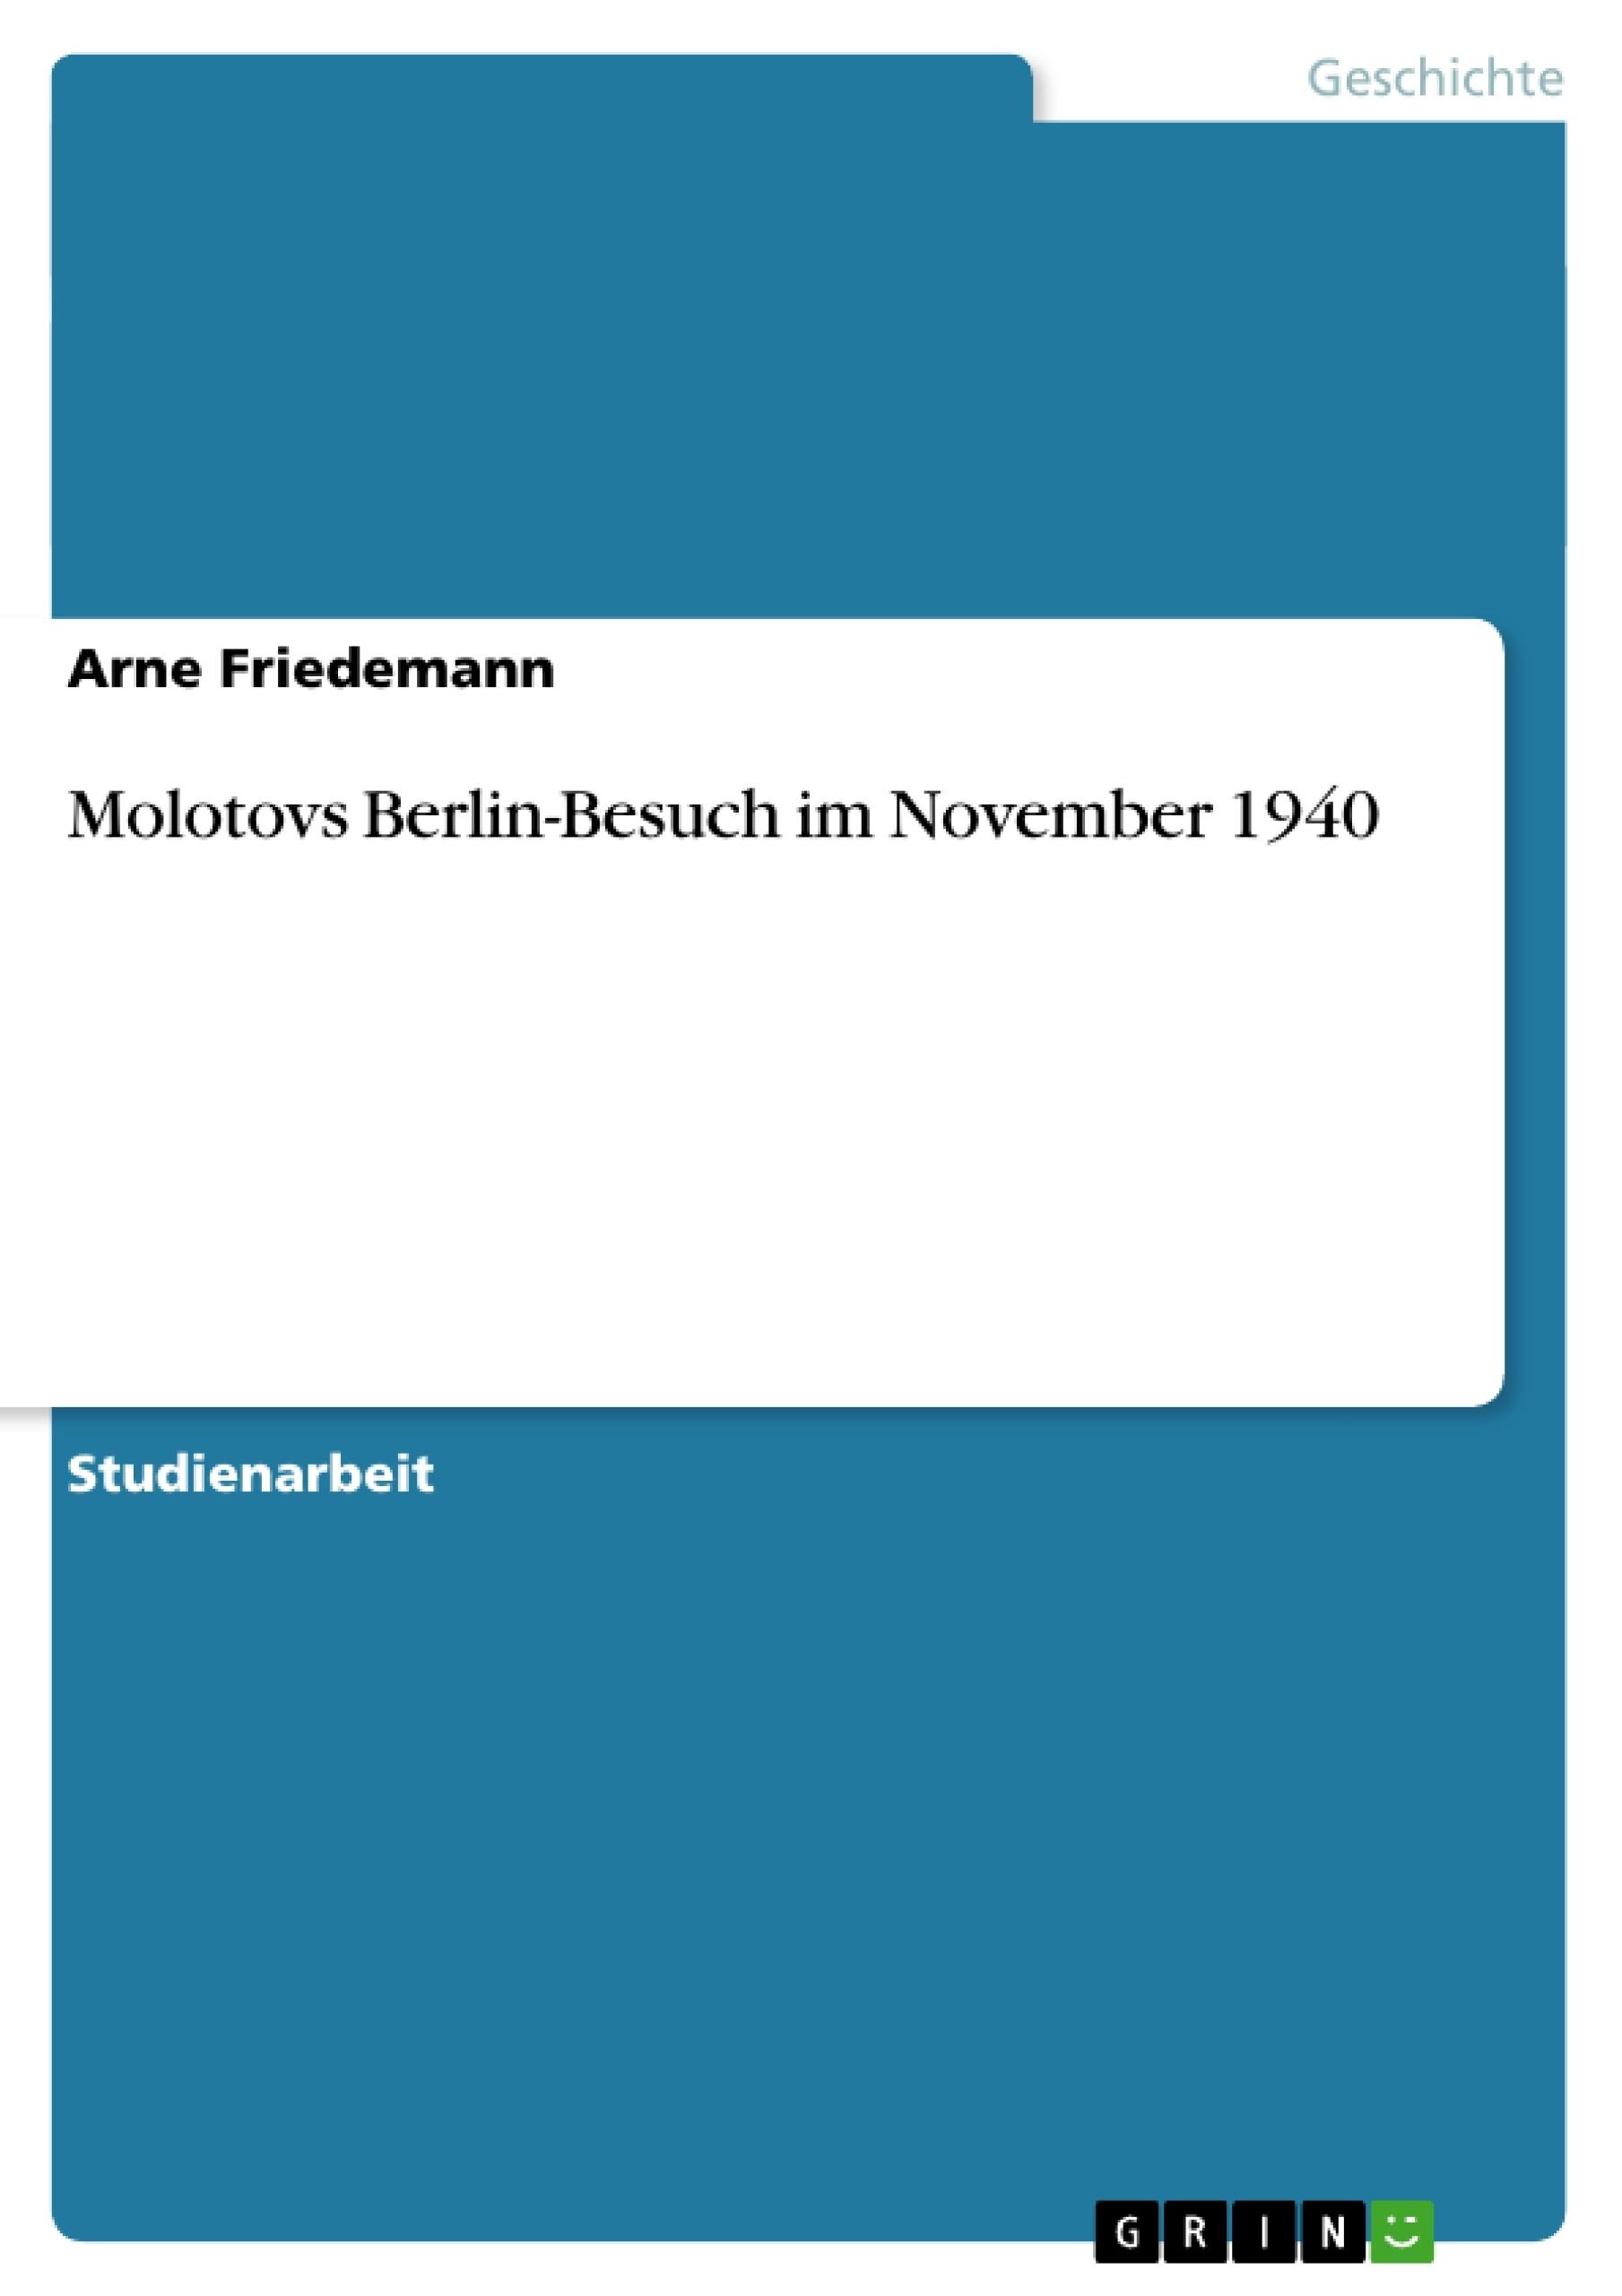 Titel: Molotovs Berlin-Besuch im November 1940